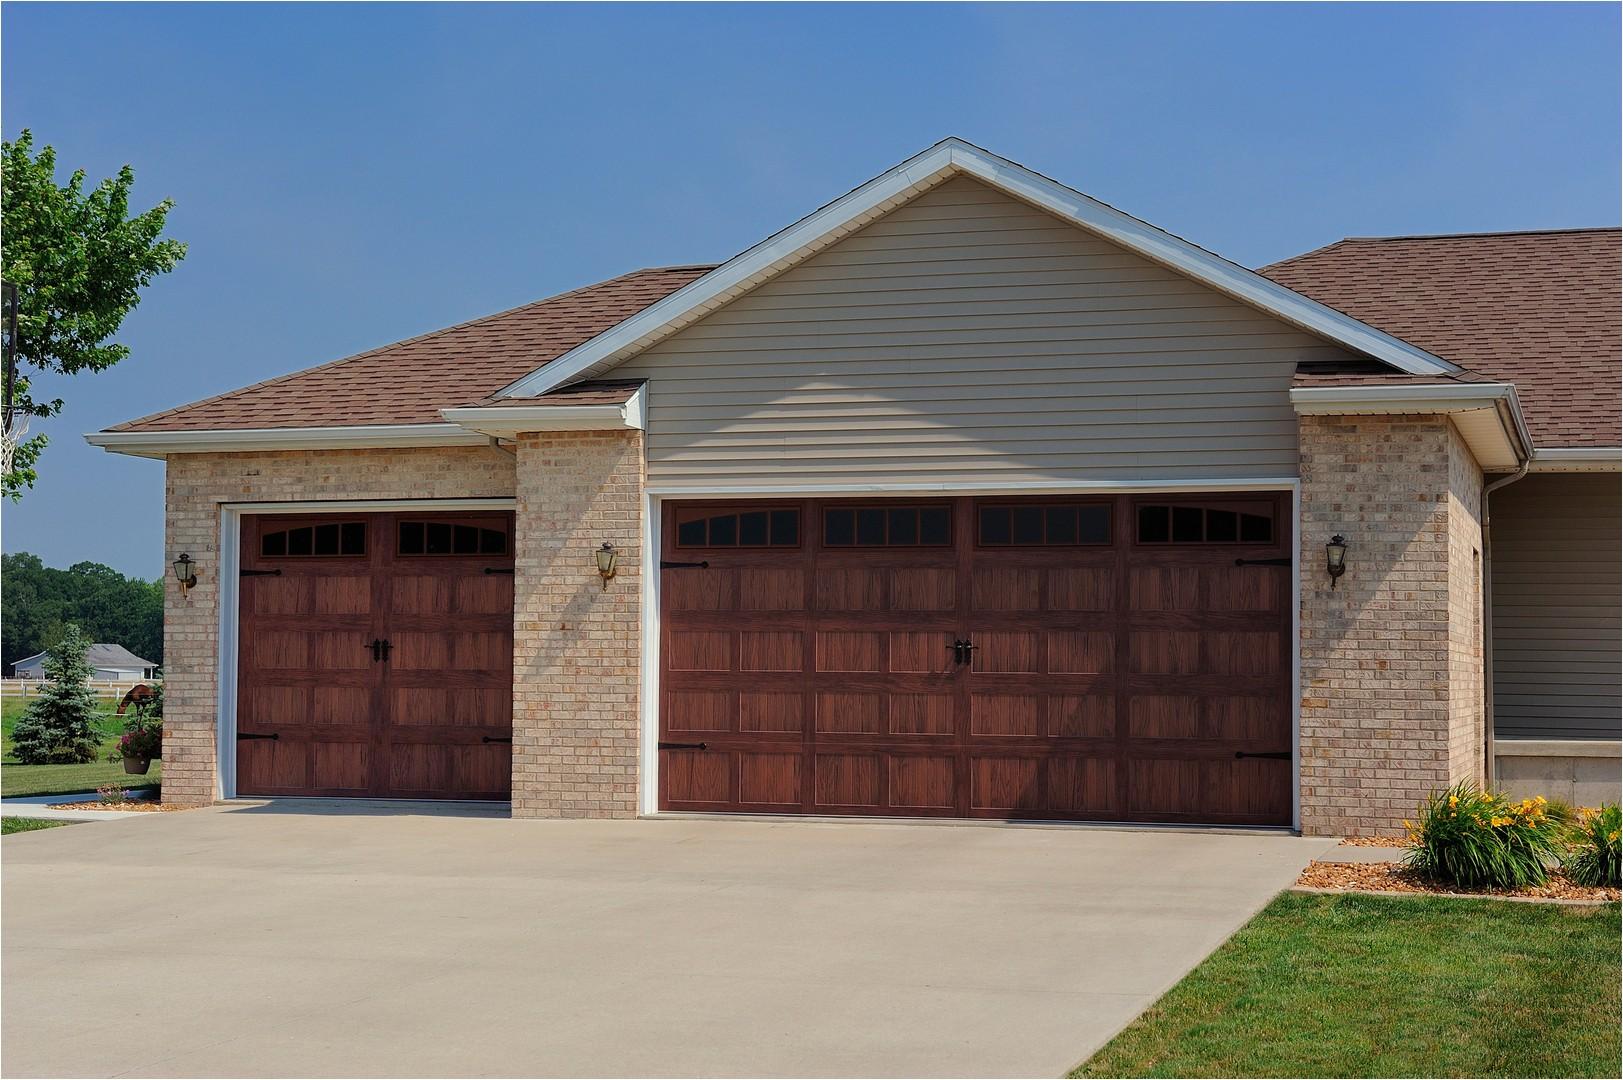 garage door repair rochester mn i40 all about wonderful home decor arrangement ideas with garage door repair rochester mn